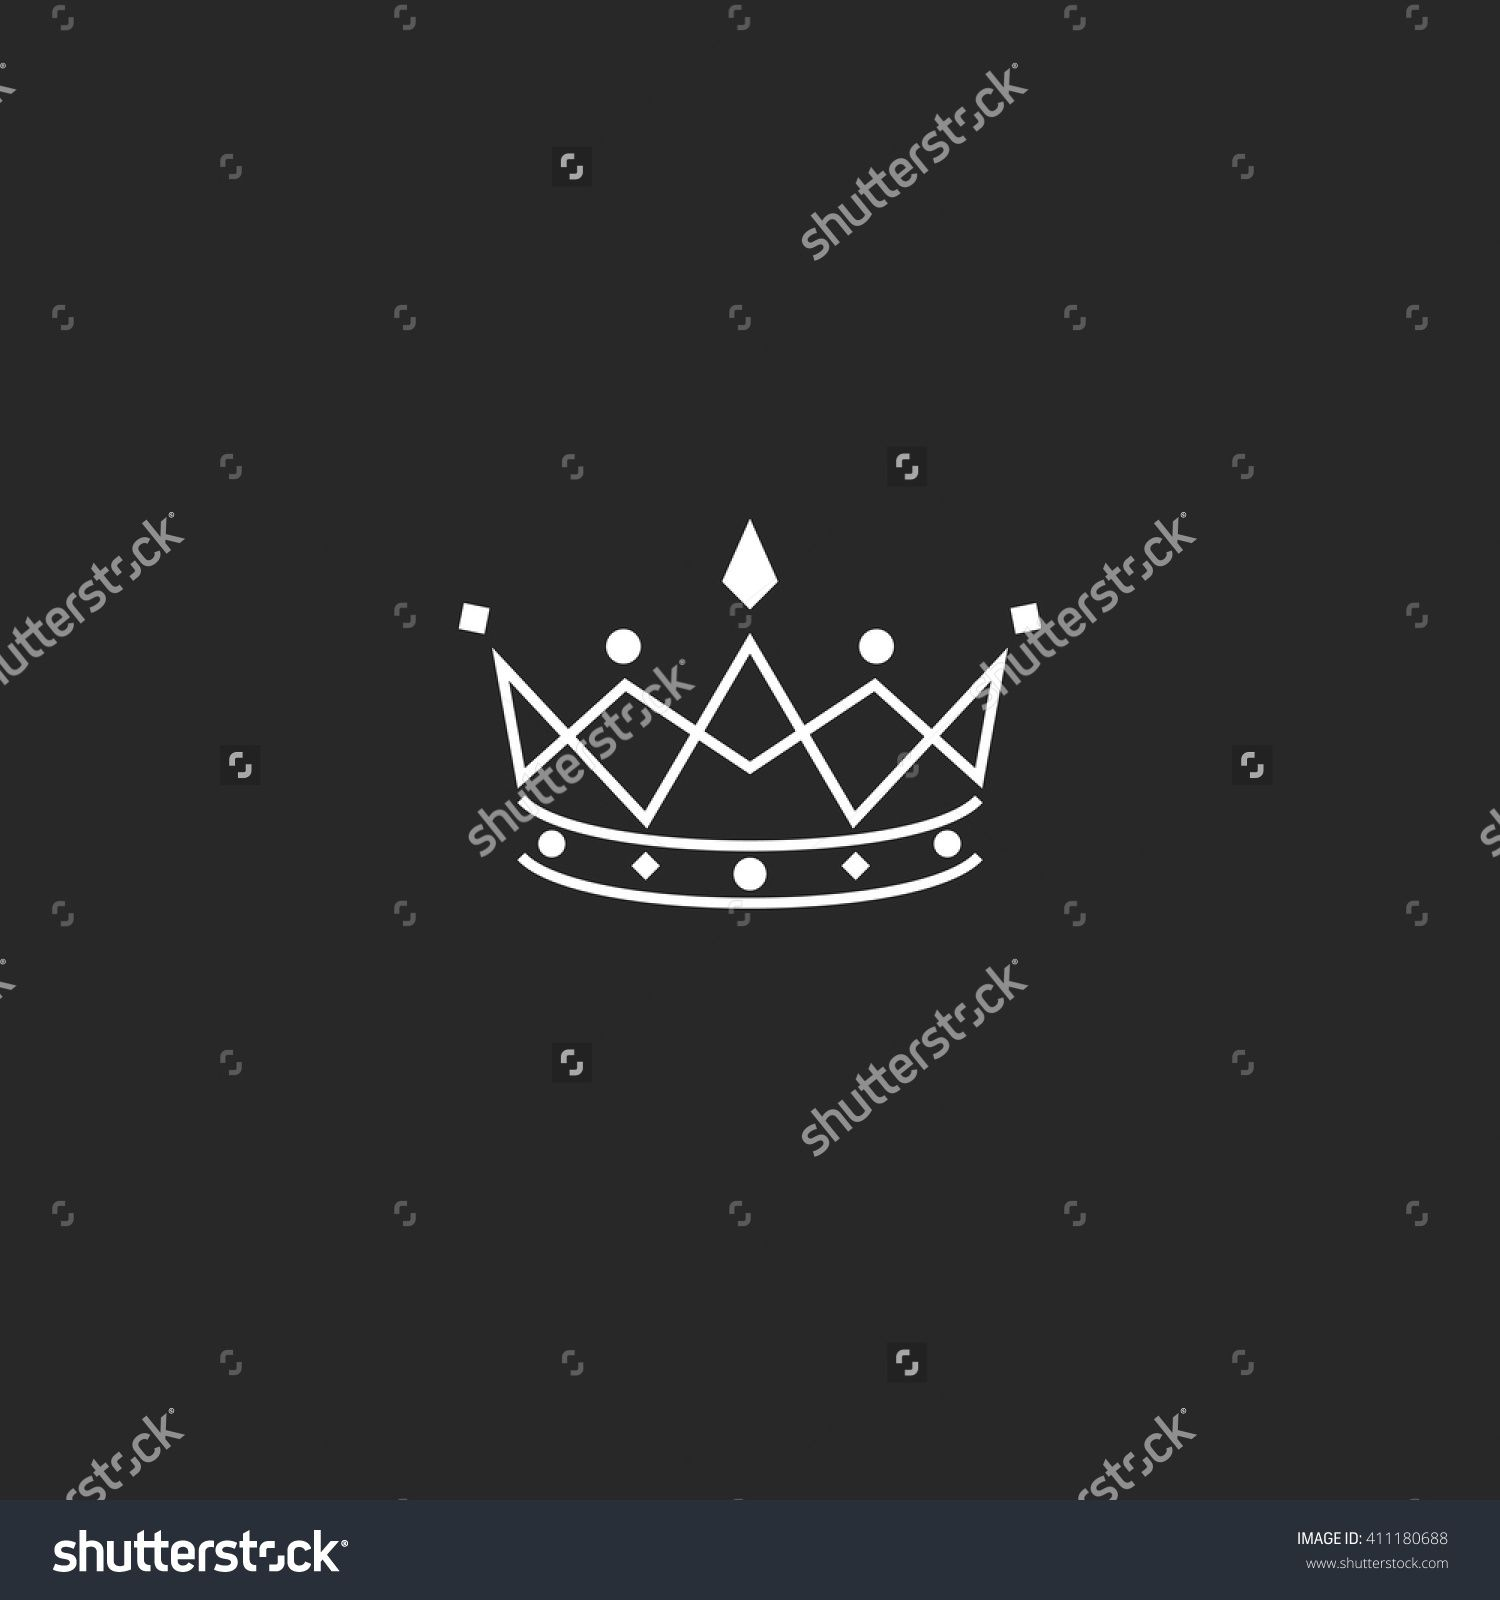 Royal symbol icon, monogram crown logo, beauty tiara princess ...